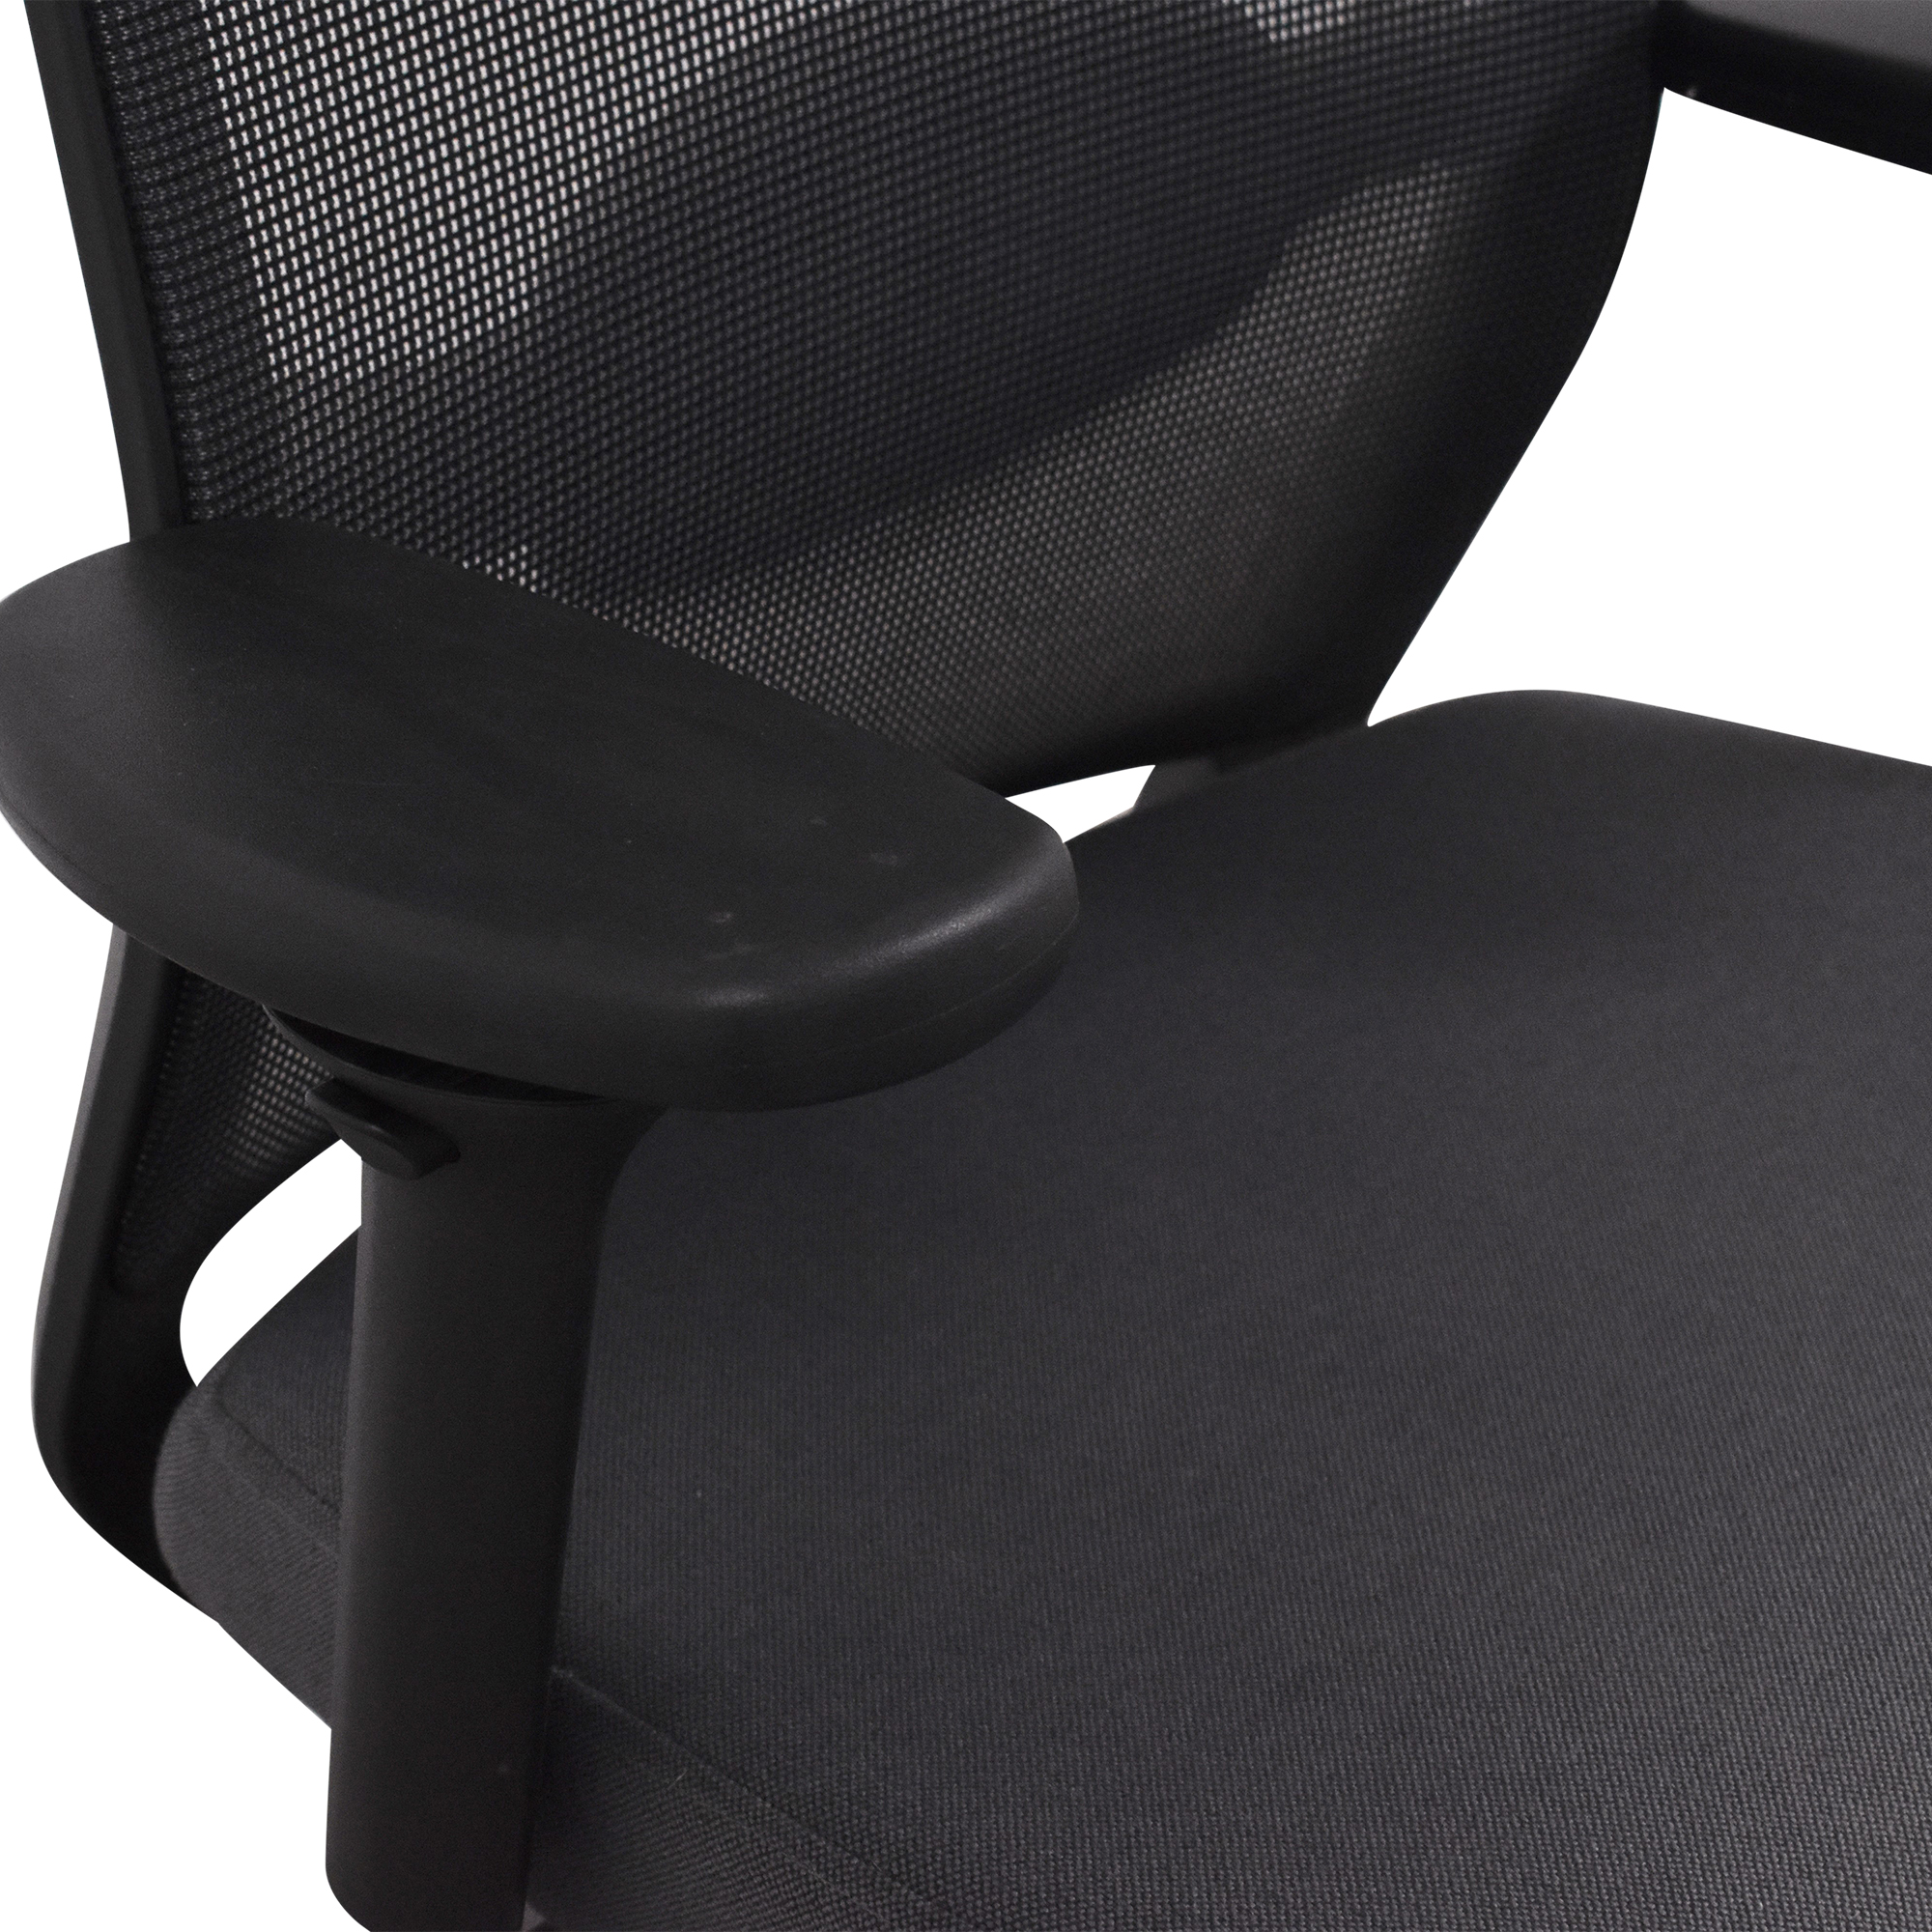 West Elm West Elm Task Chair Black